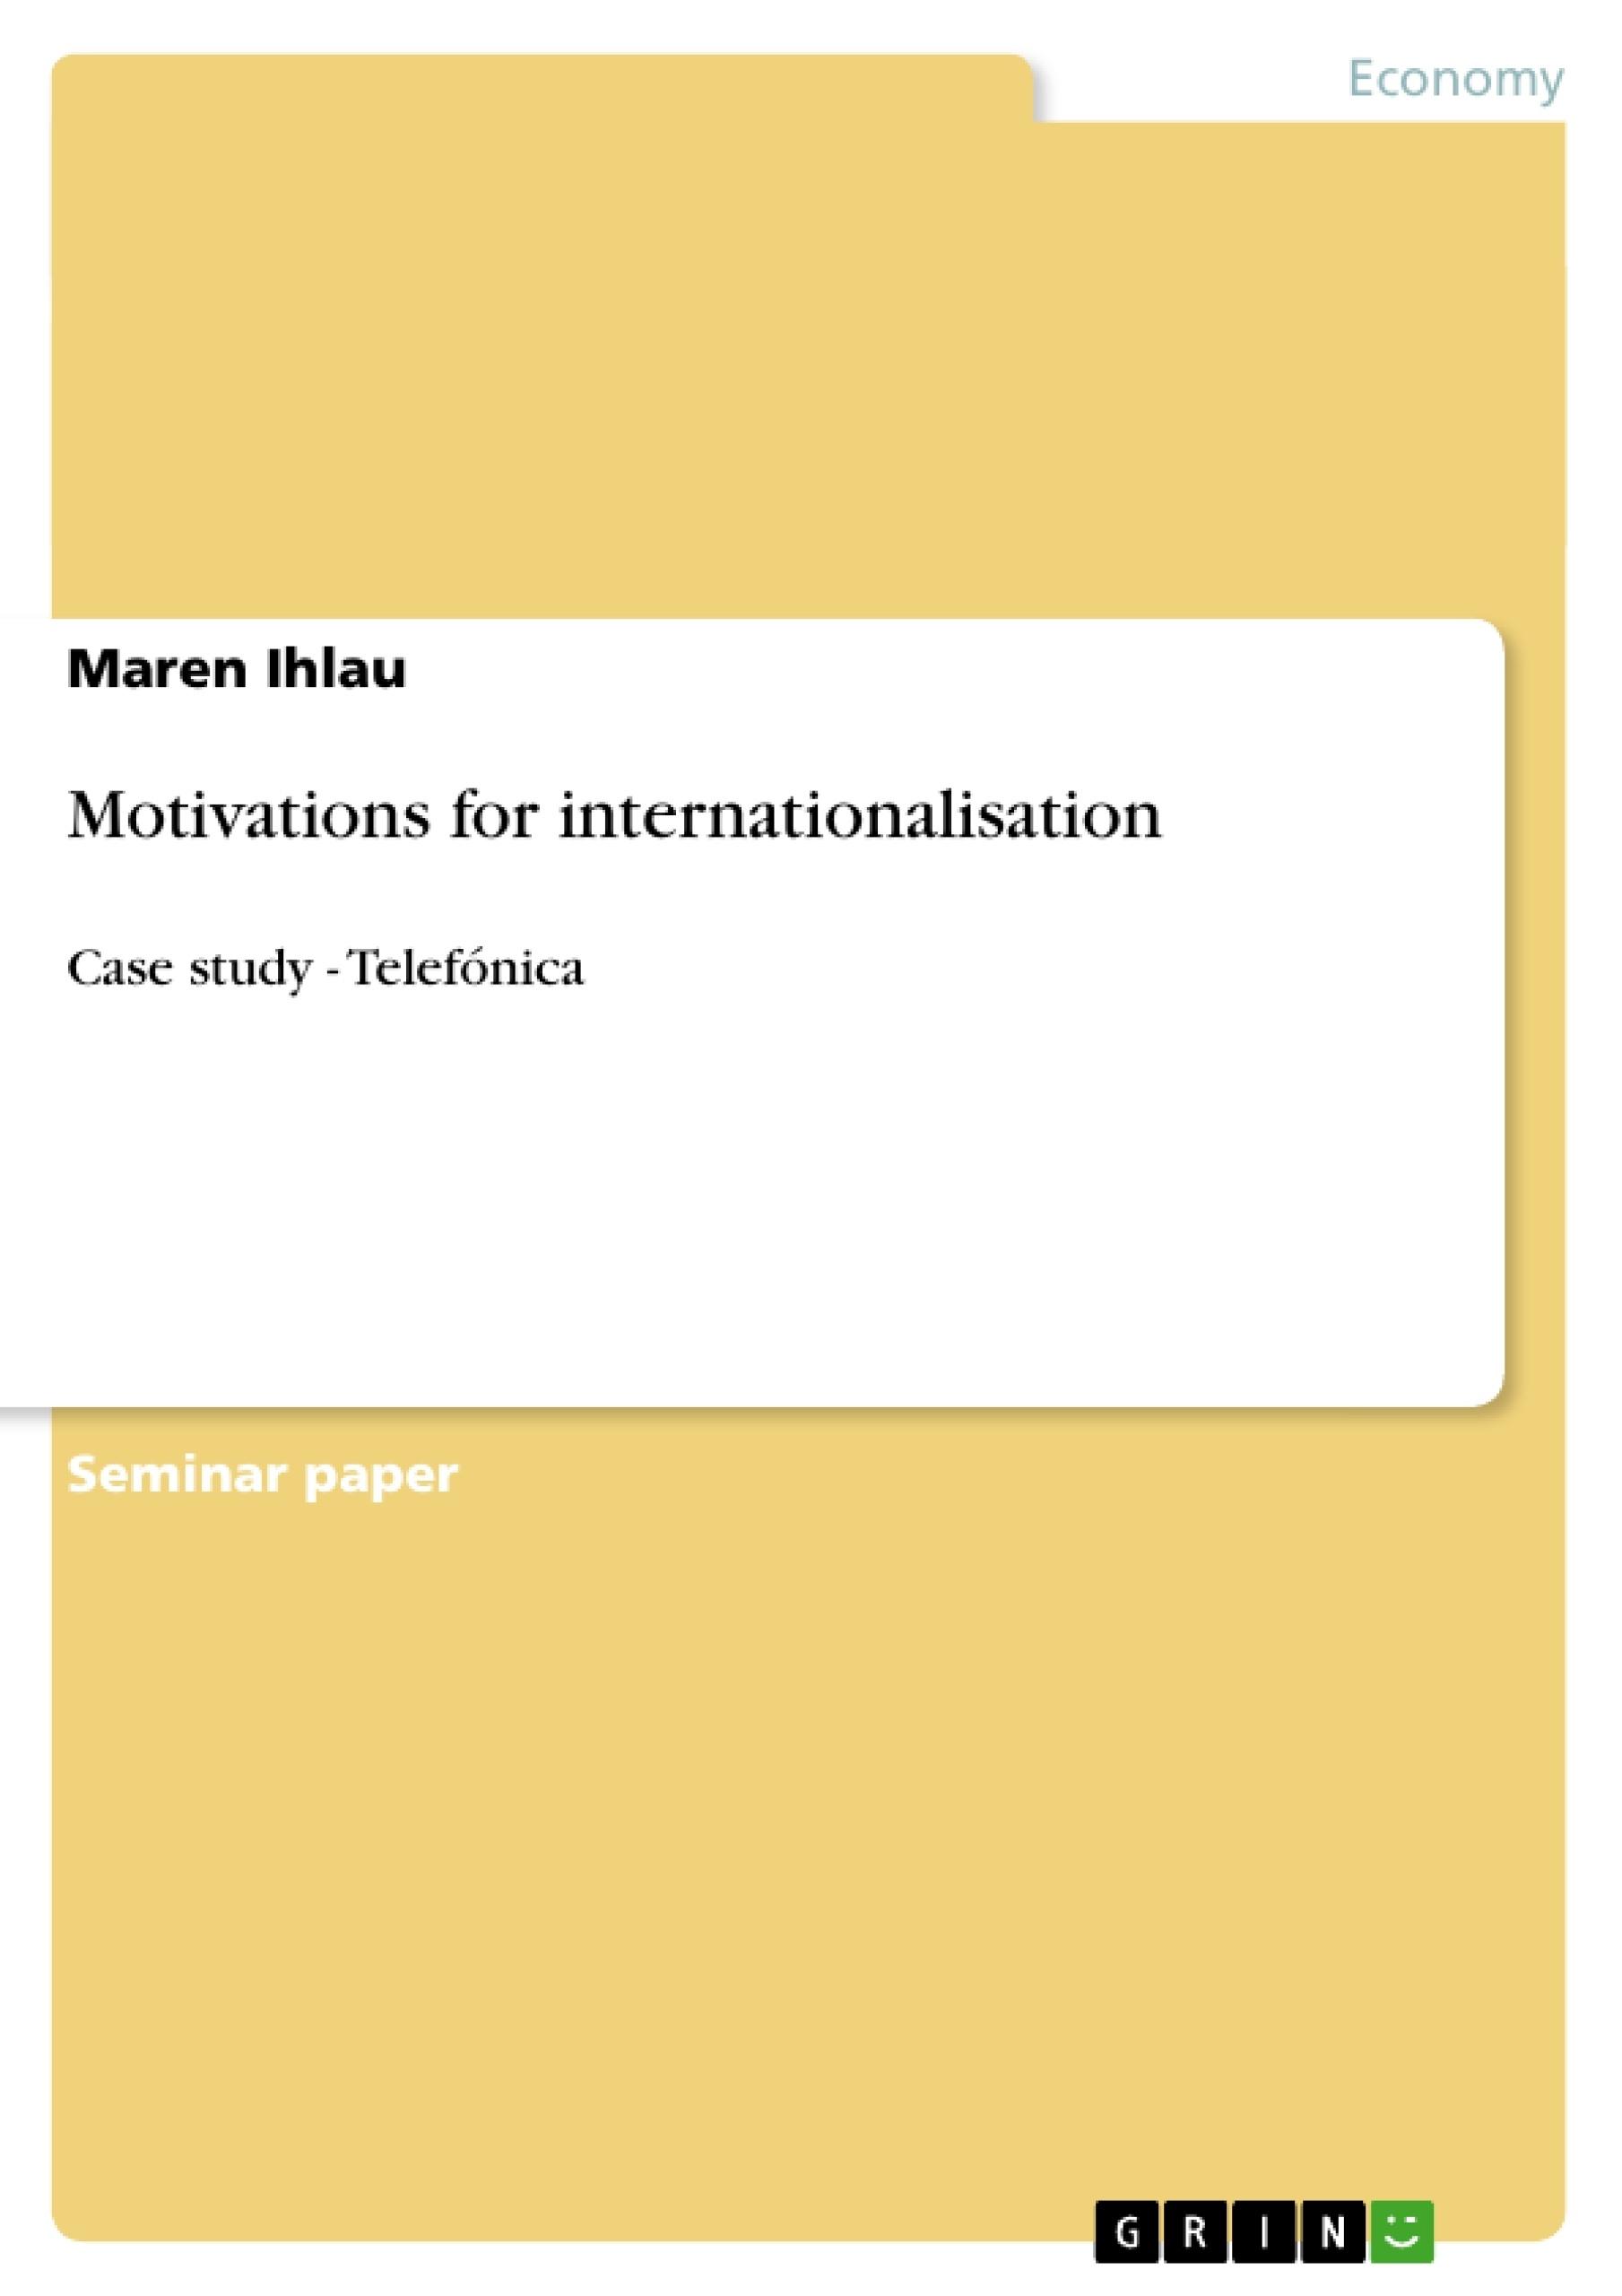 Title: Motivations for internationalisation